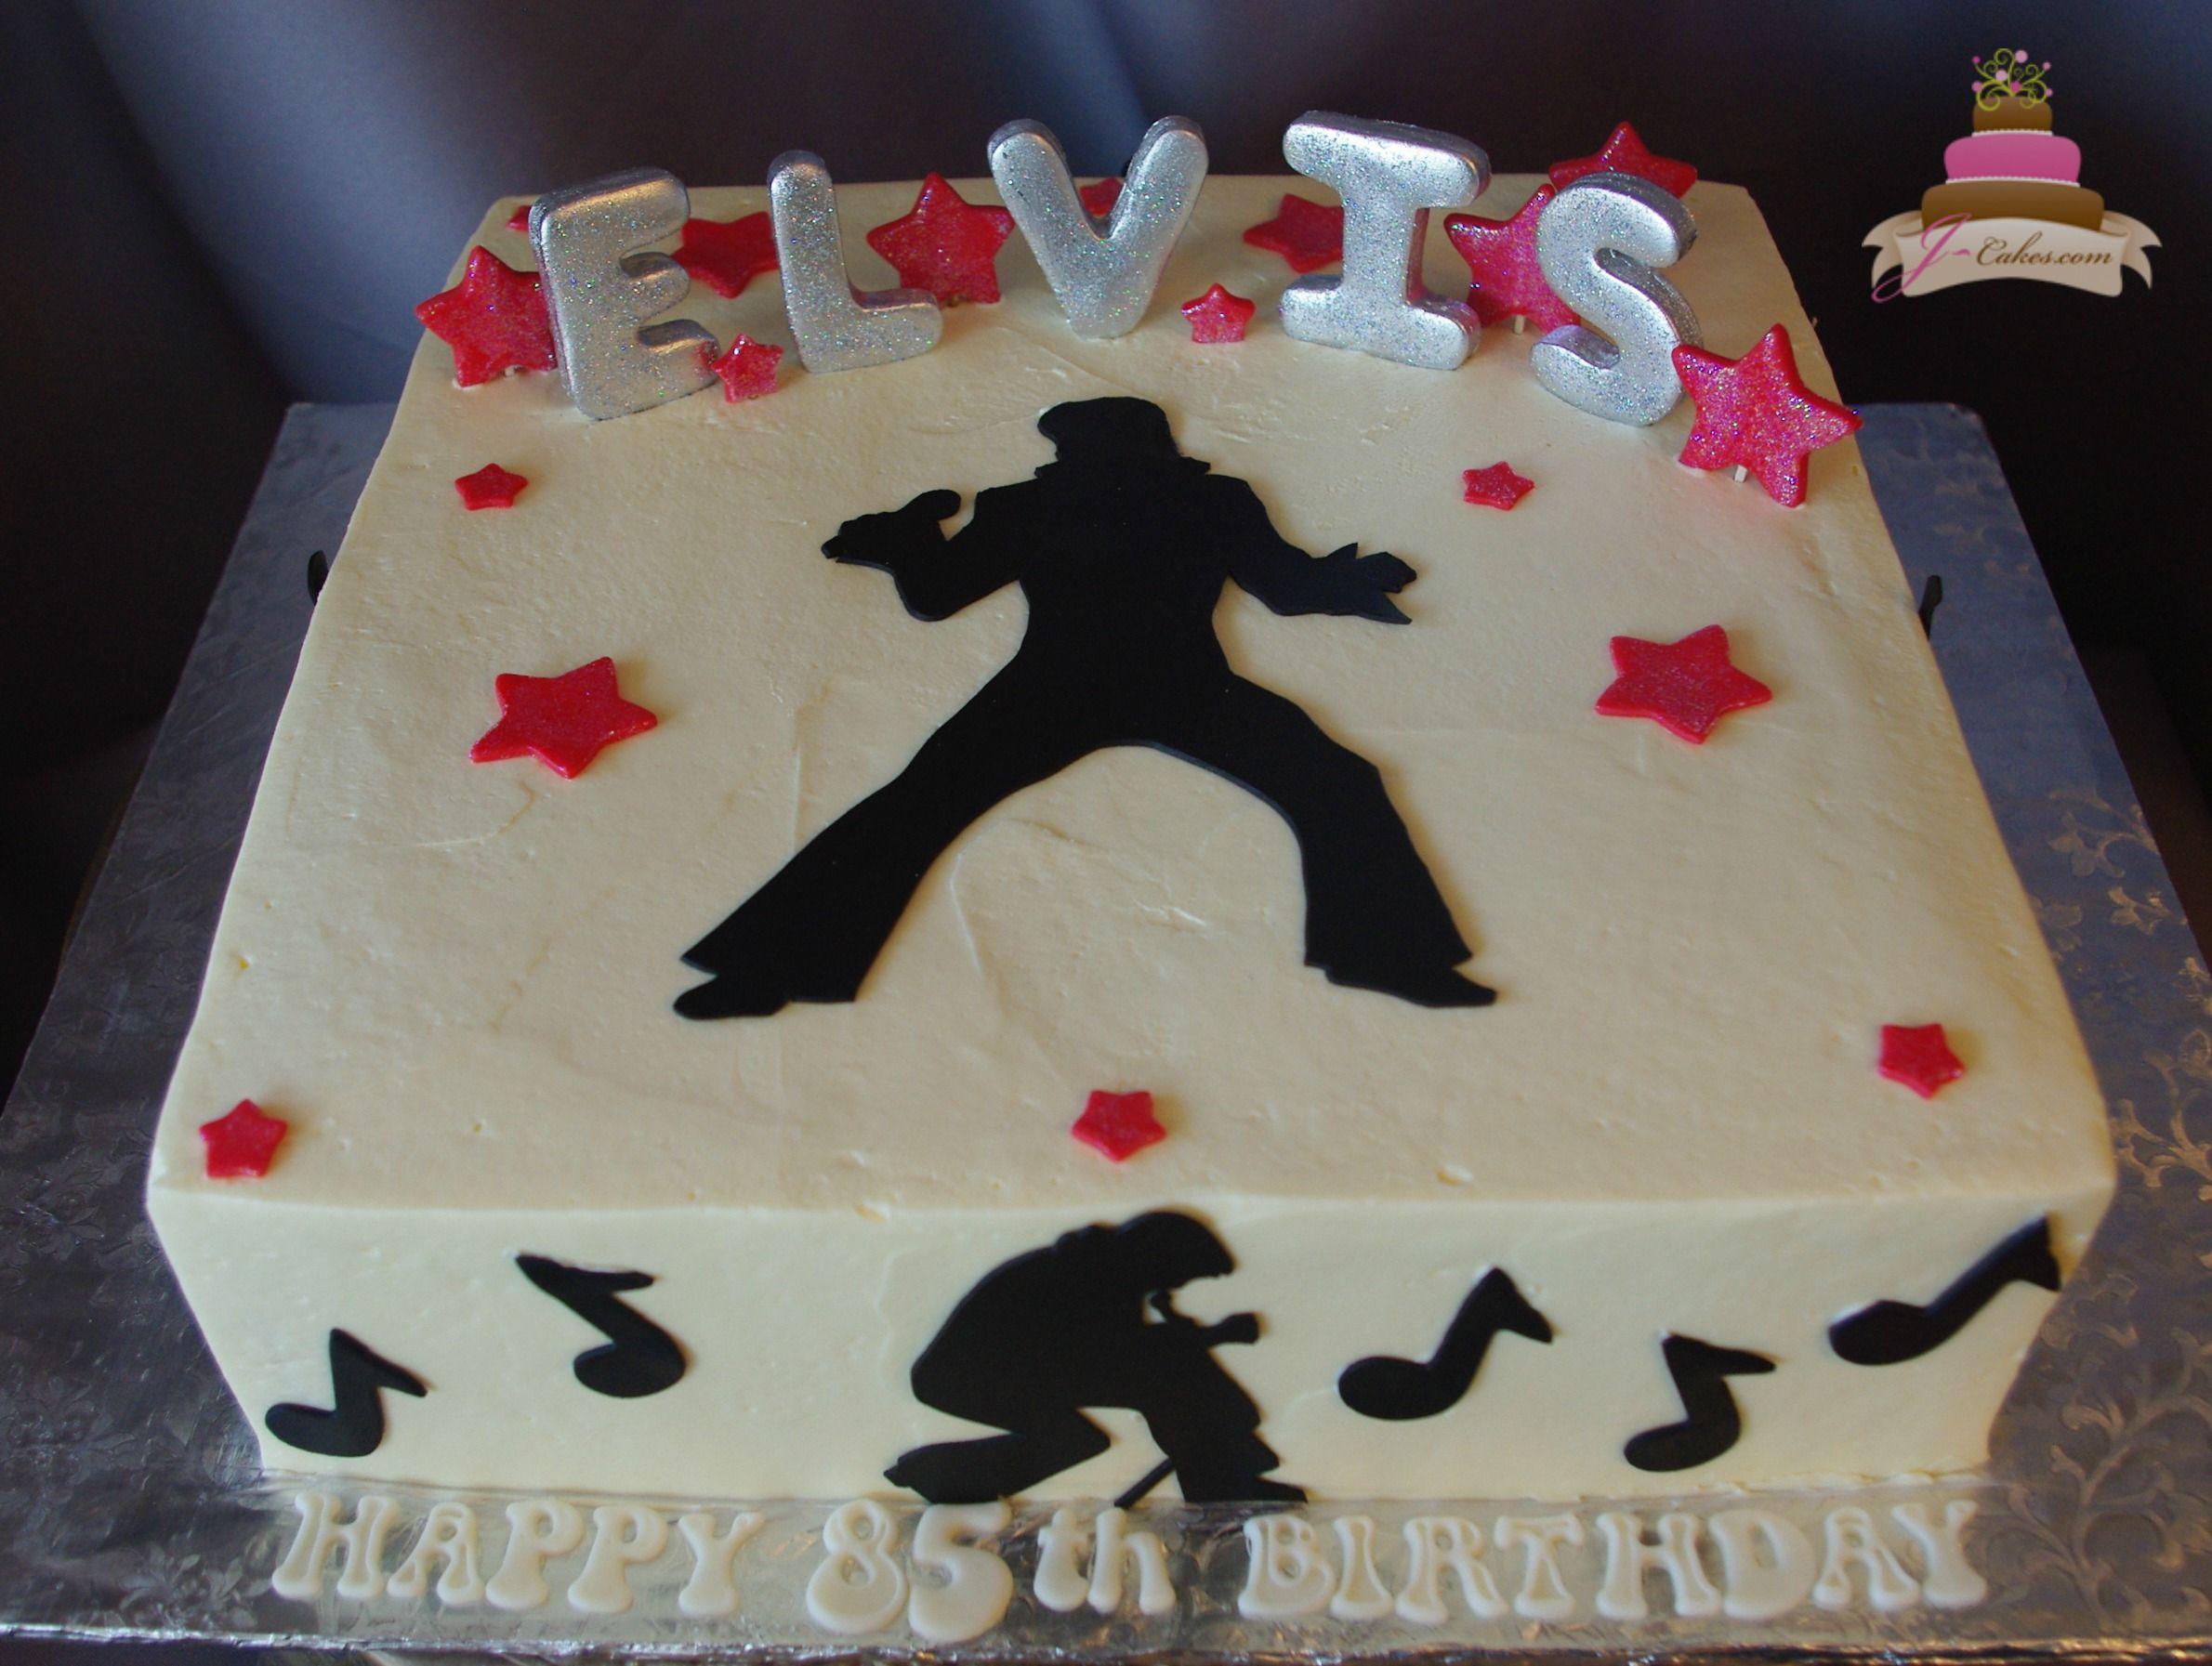 166 Elvis Birthday Cake Birthday Cakes Pinterest Elvis Cakes